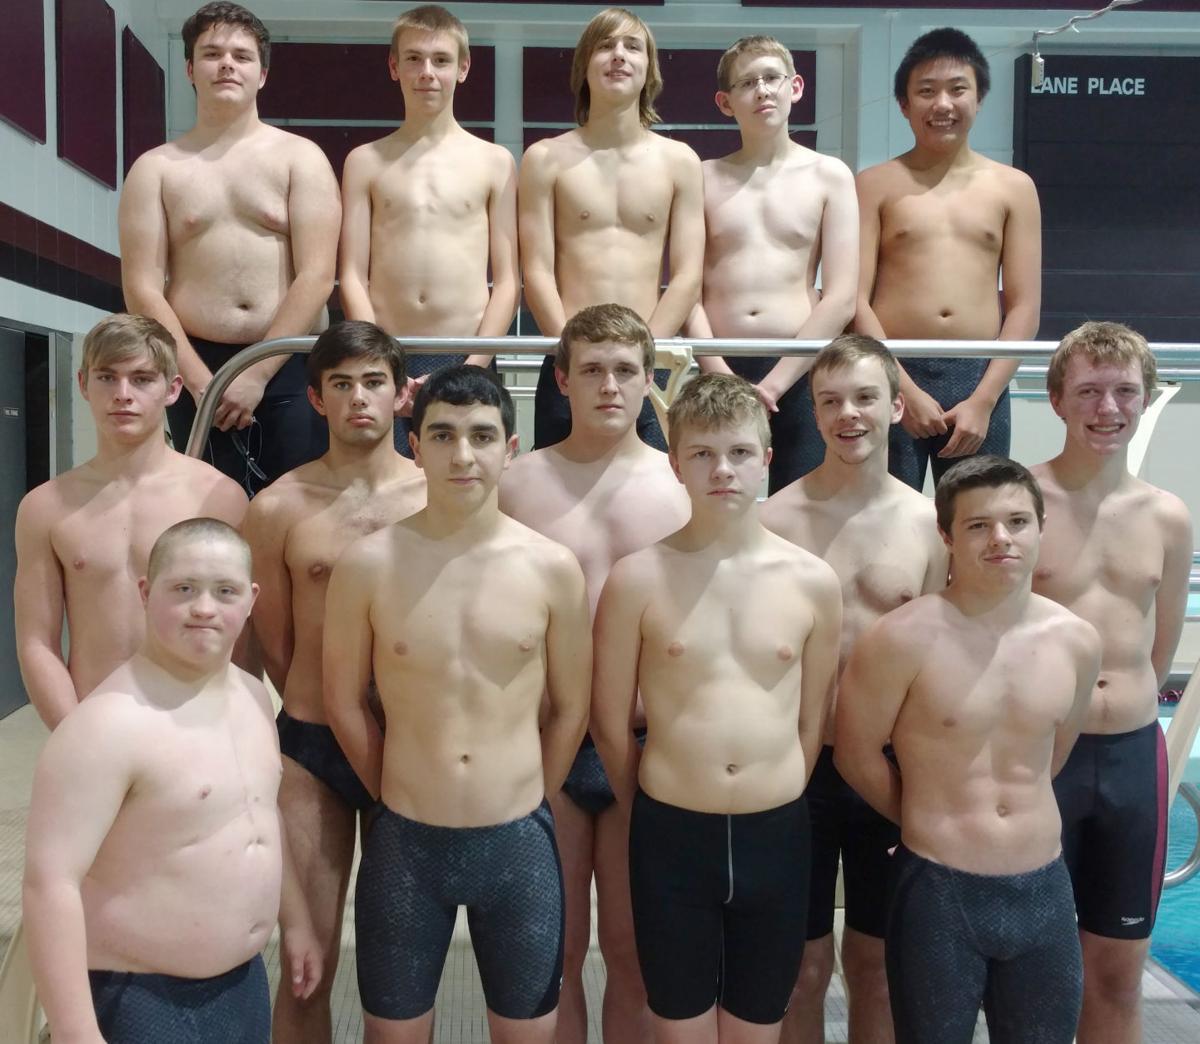 Teen Boy Swimmer Pics | Free HD Wallpapers